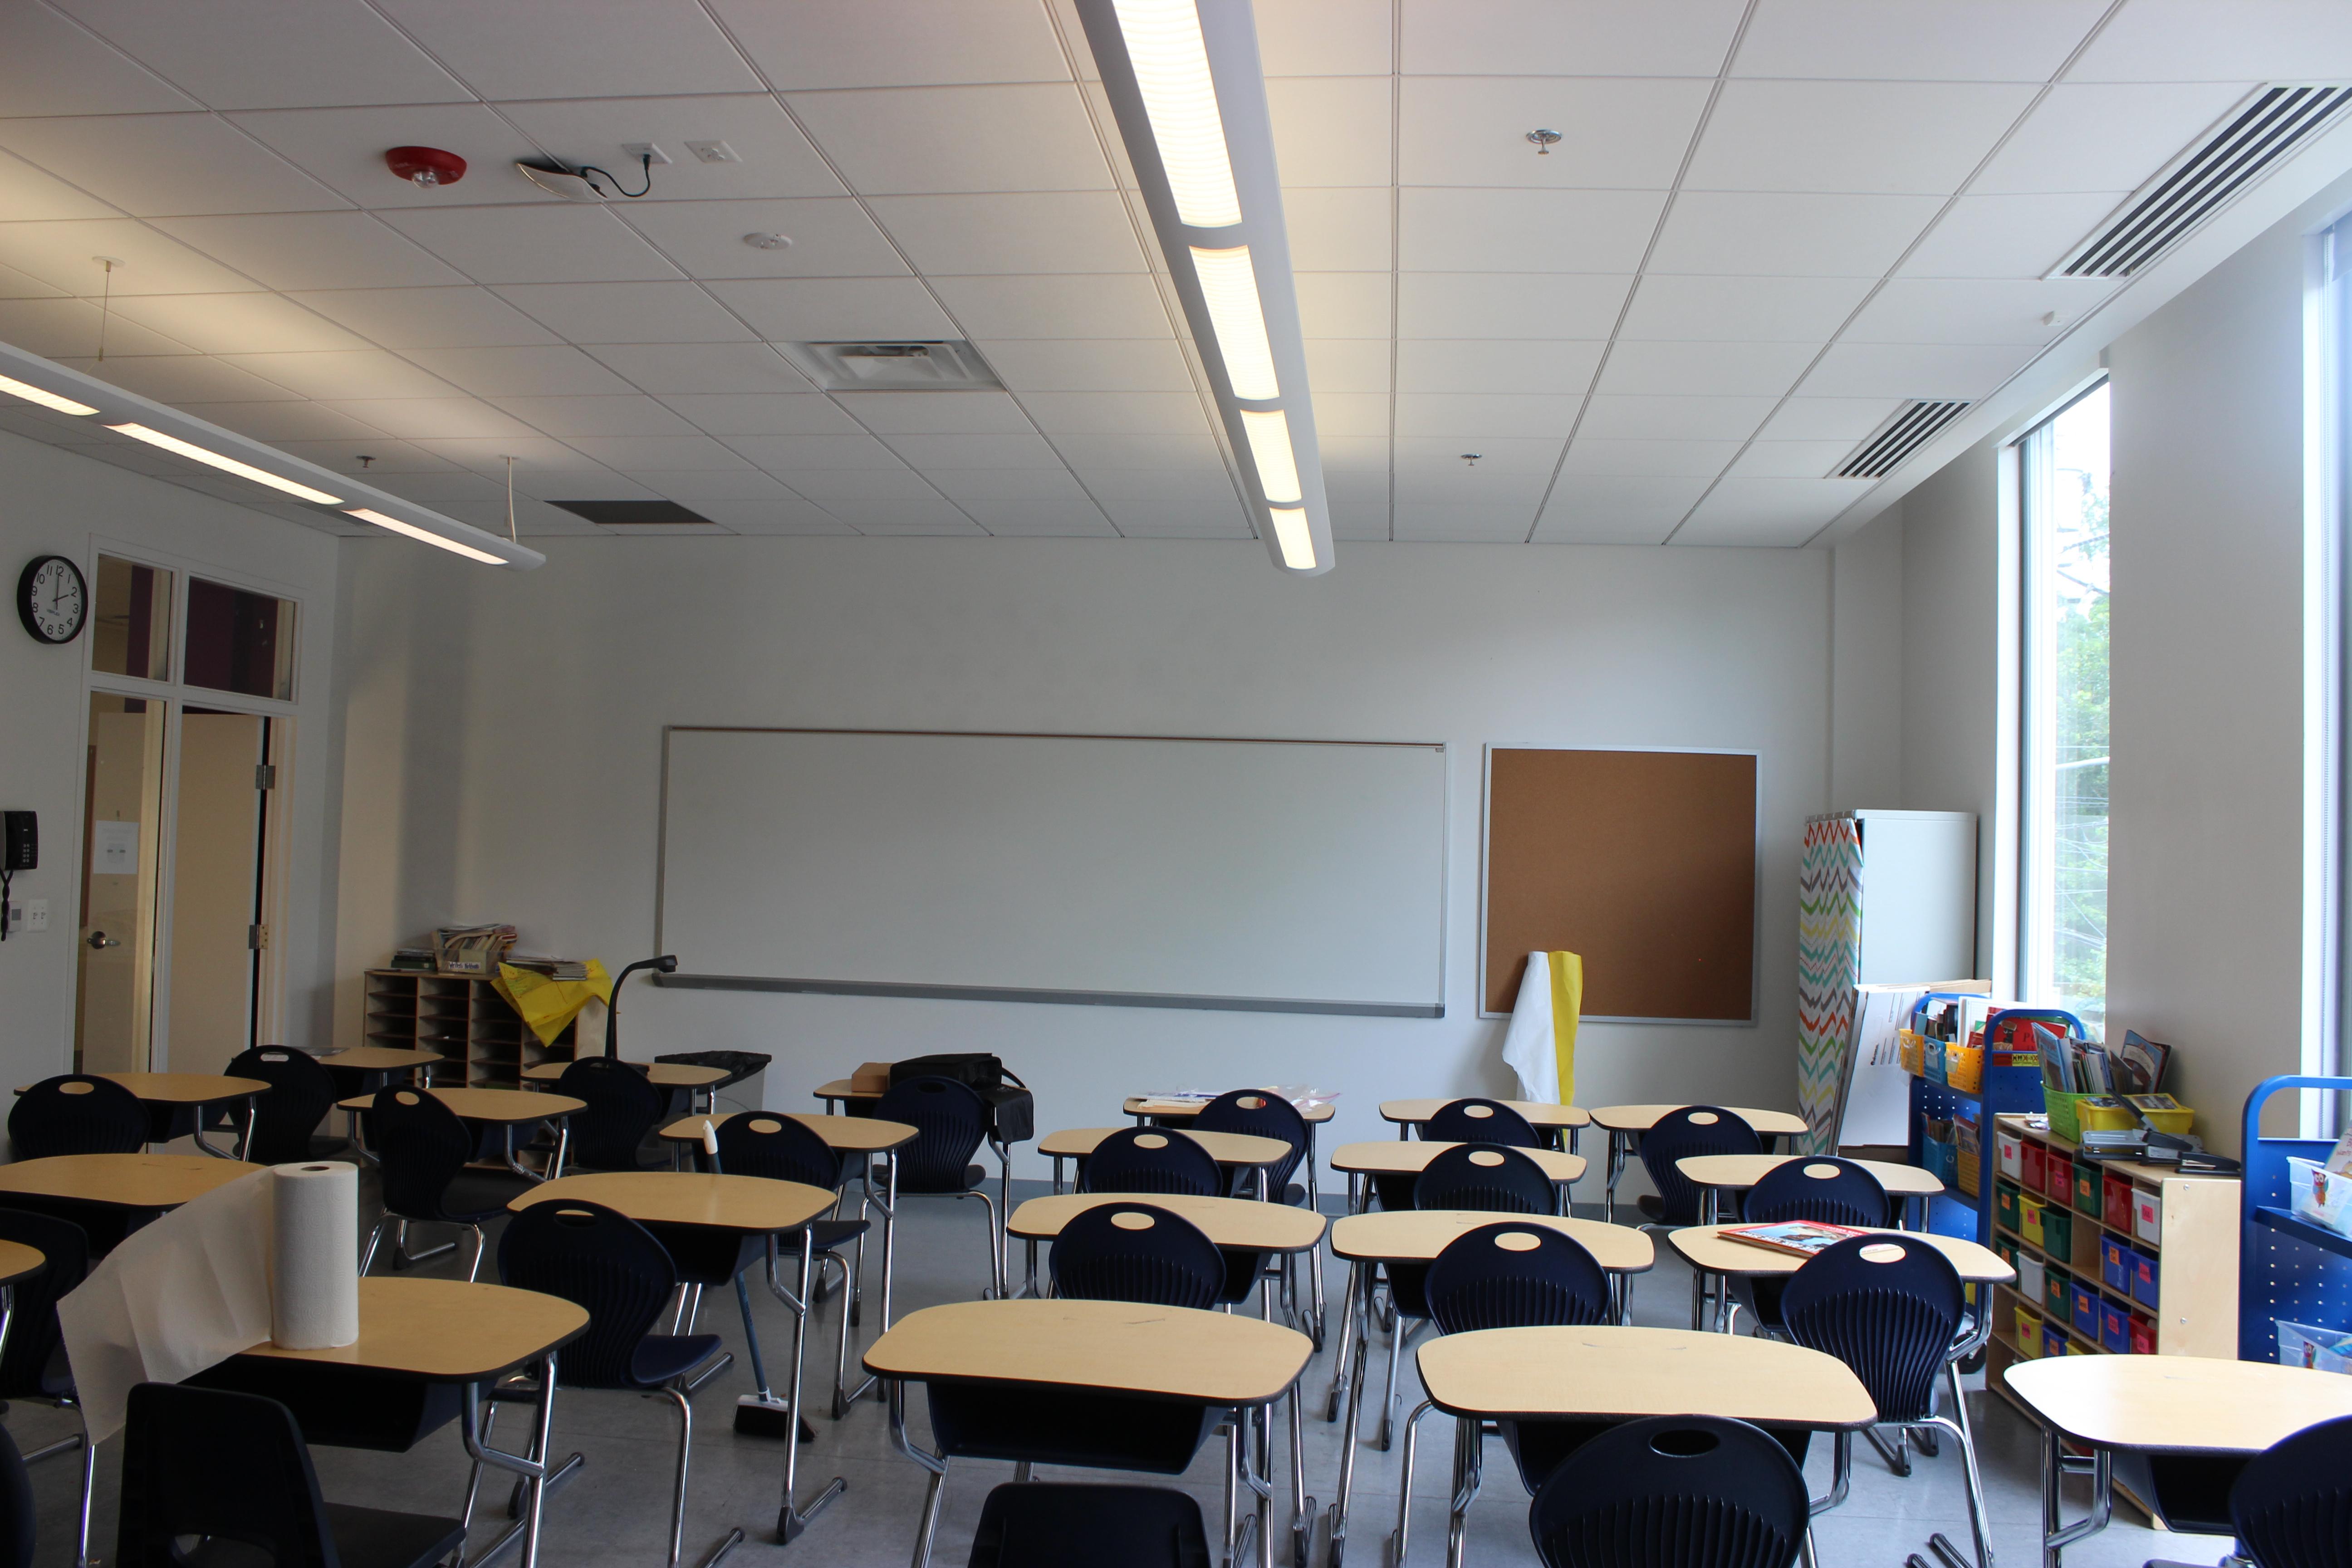 DC PREP Public Charter School